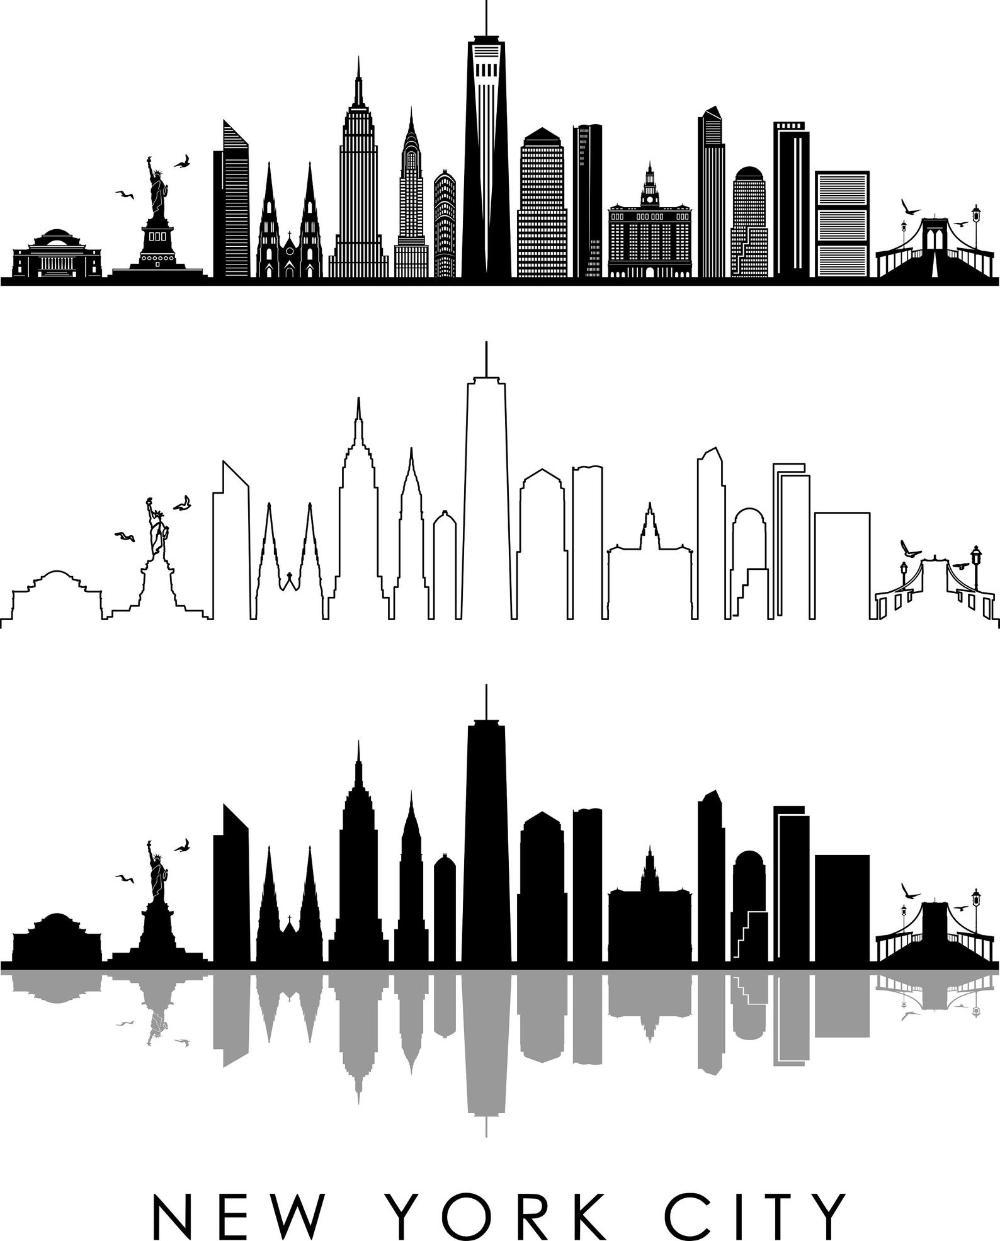 New York City Usa Skyline Outline Silhouette Vector Svg Eps Etsy City Skyline Art New York Skyline Silhouette City Skyline Silhouette